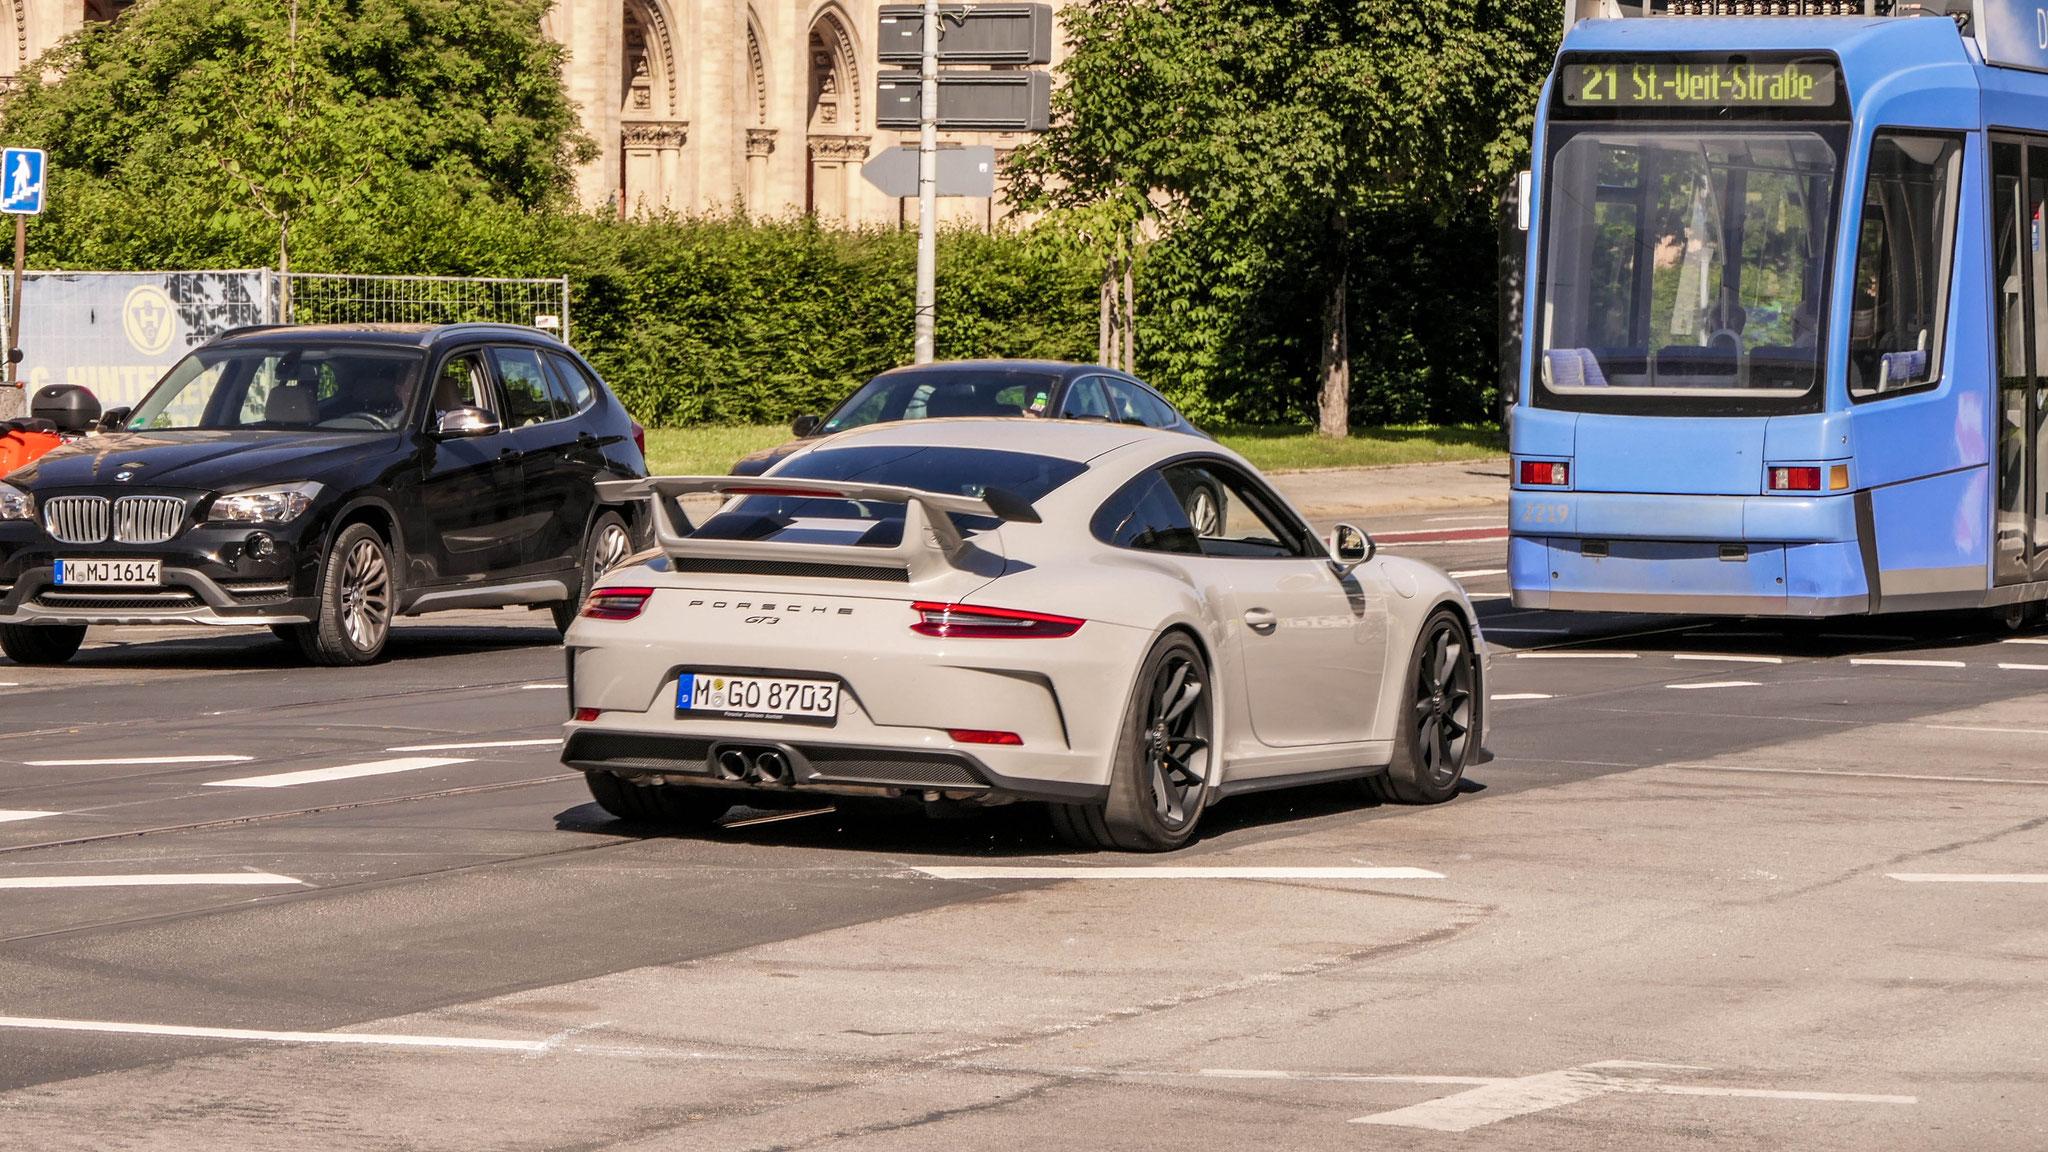 Porsche 991 GT3 - M-GO-8703